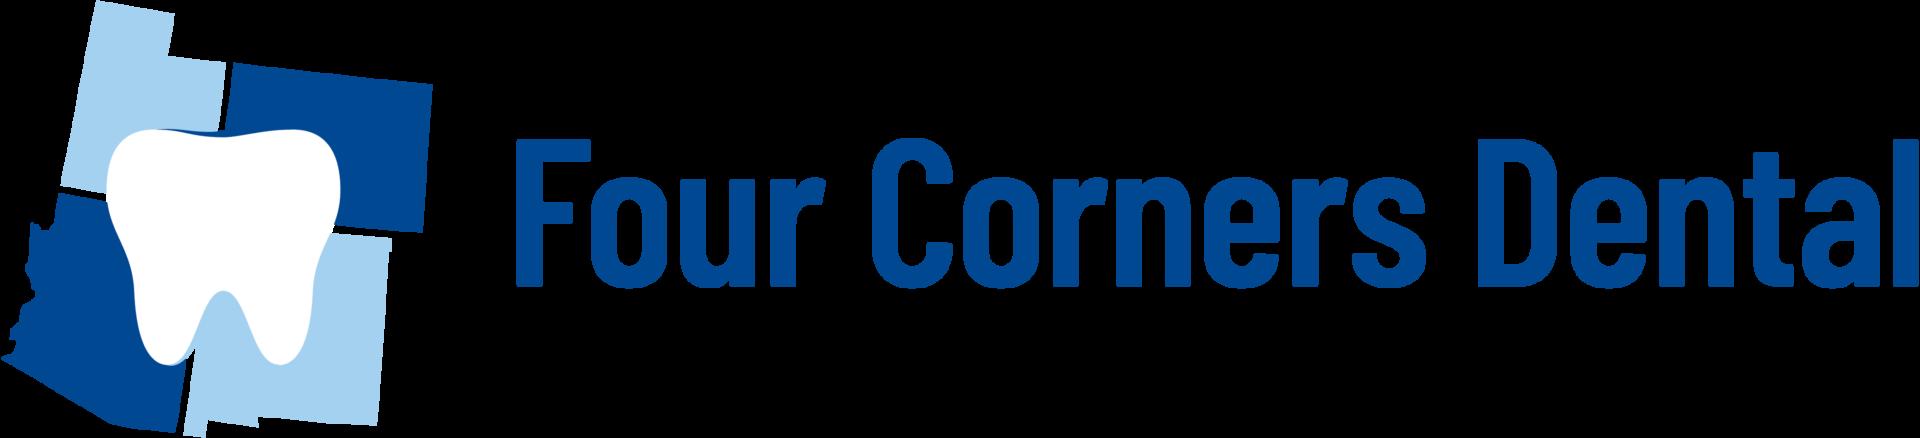 Four Corners Dental - Horizontal